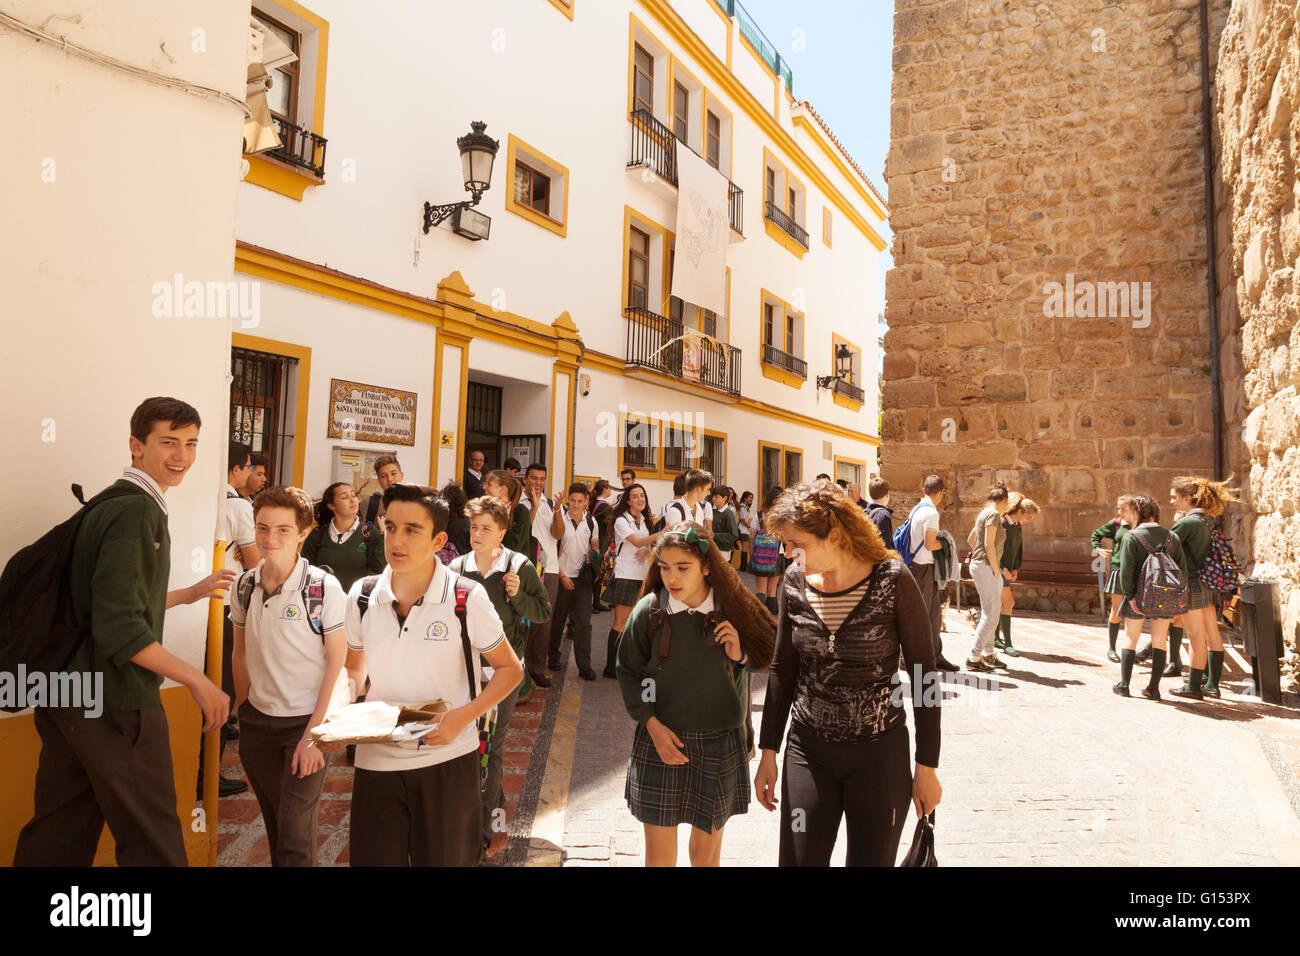 Spanish school children leaving school, Marbella, Andalusia Spain Europe - Stock Image